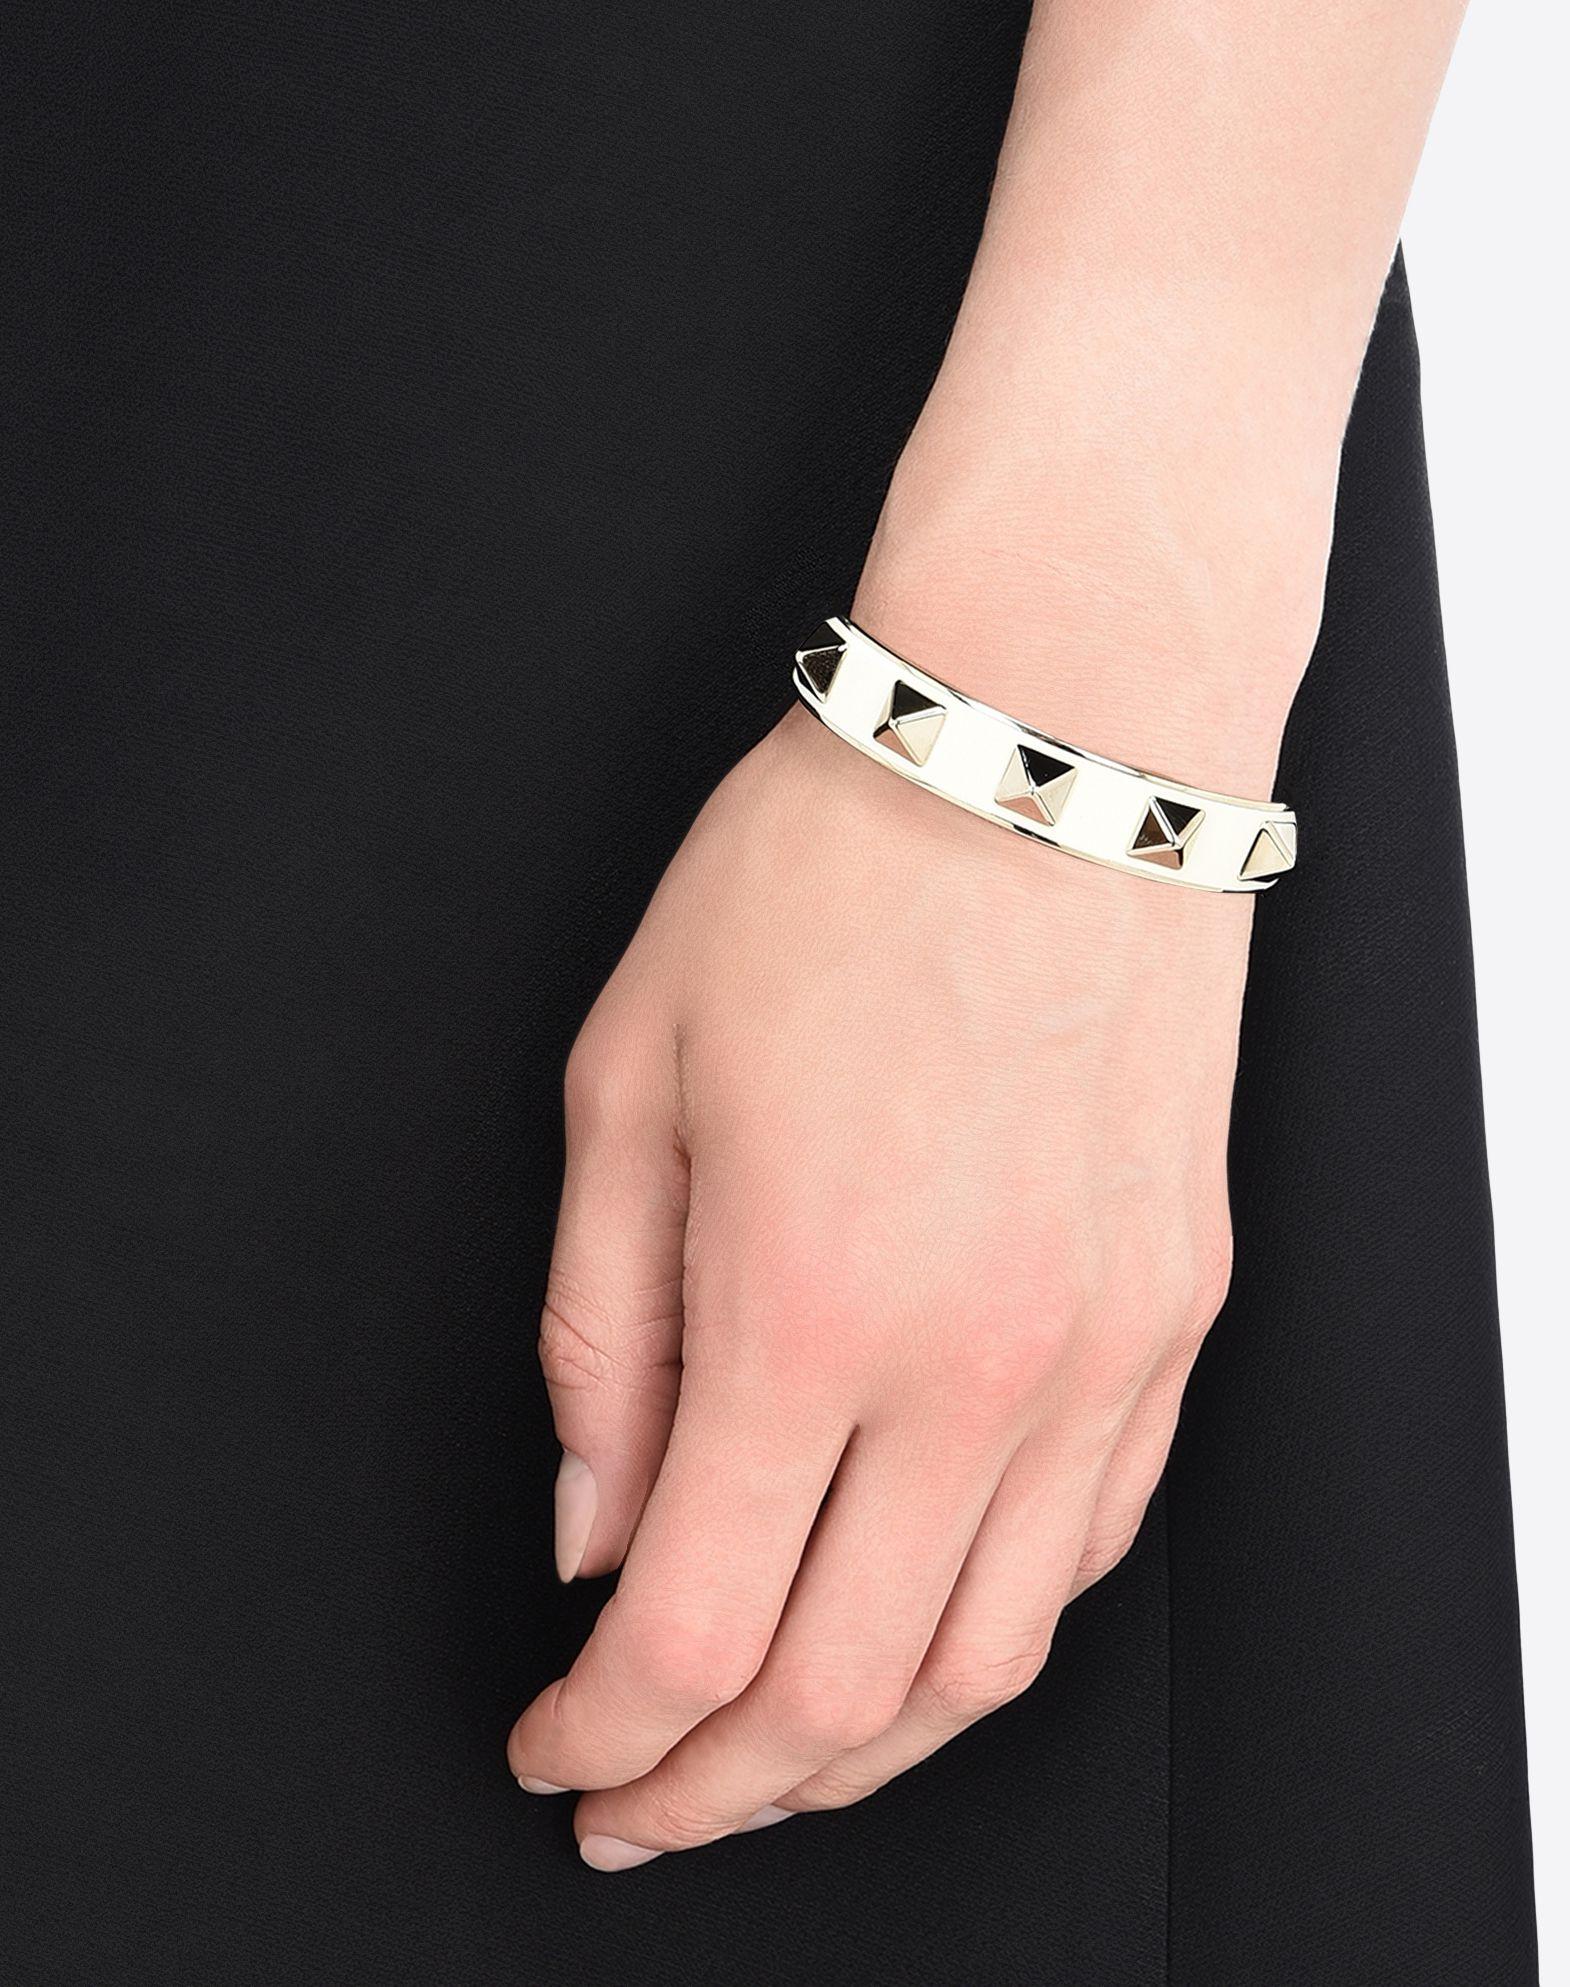 Valentino Rockstud bracelet cuff - Black pSXyXuE7